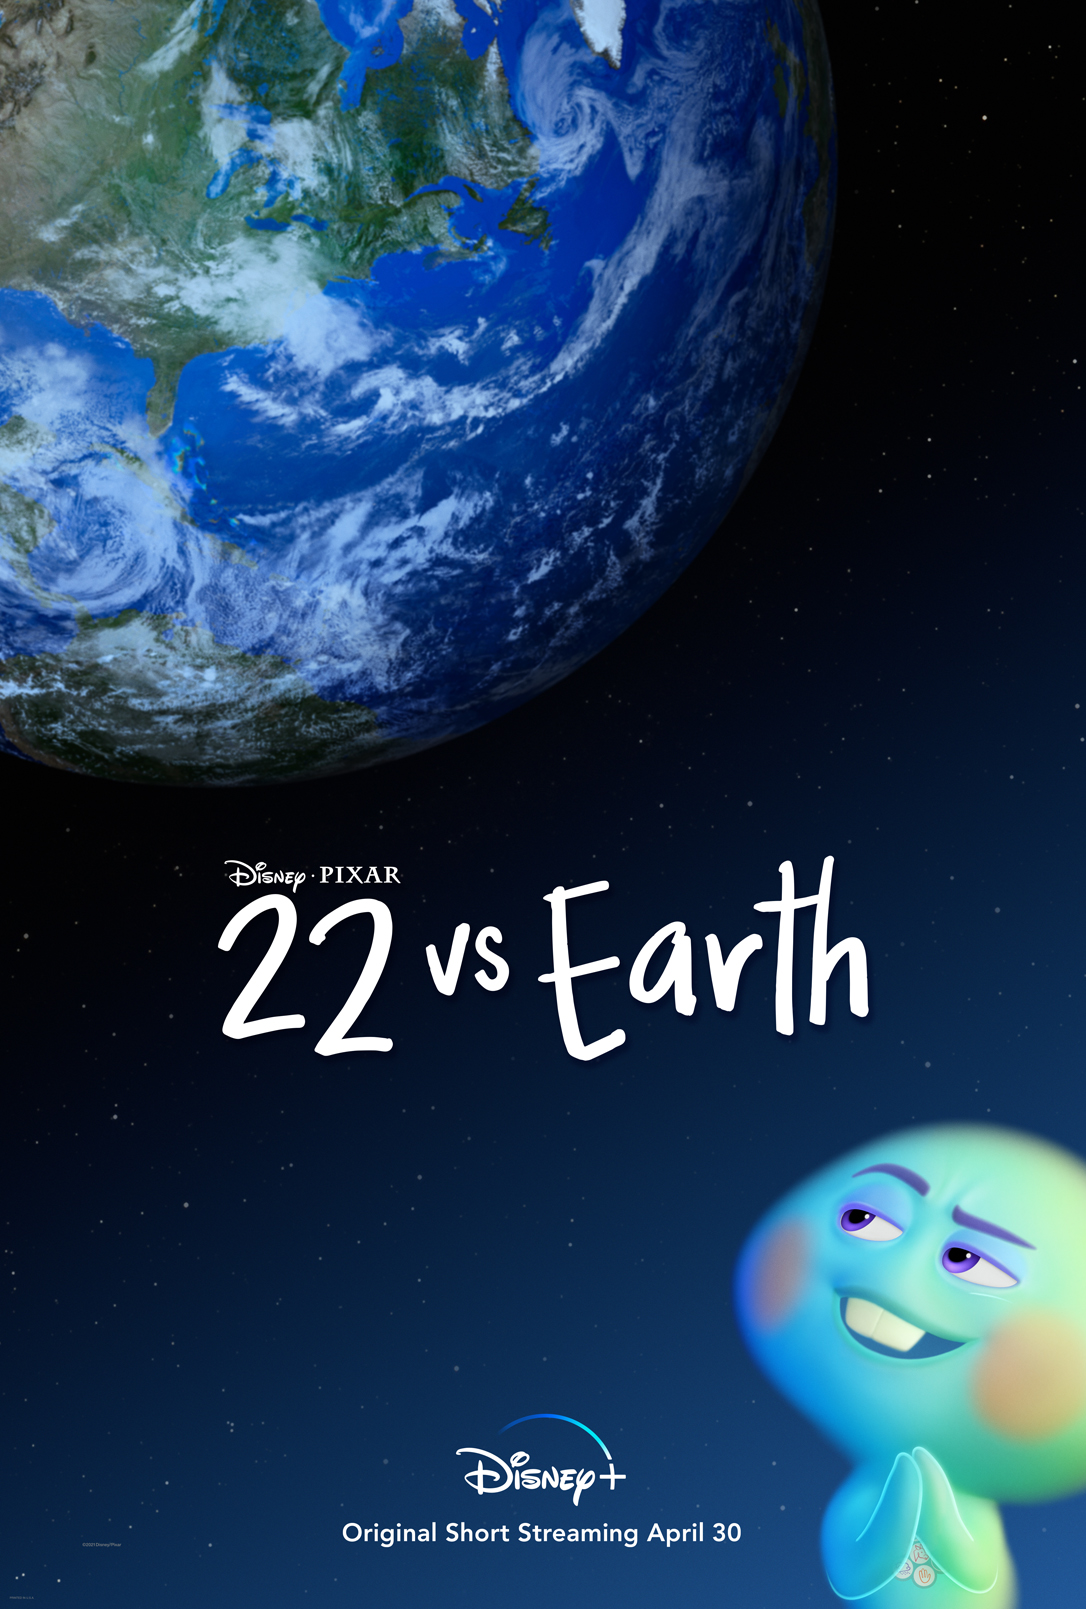 22 contre la Terre [Cartoon Pixar - 2021] Ez8JZbeUYAIlCql?format=jpg&name=large